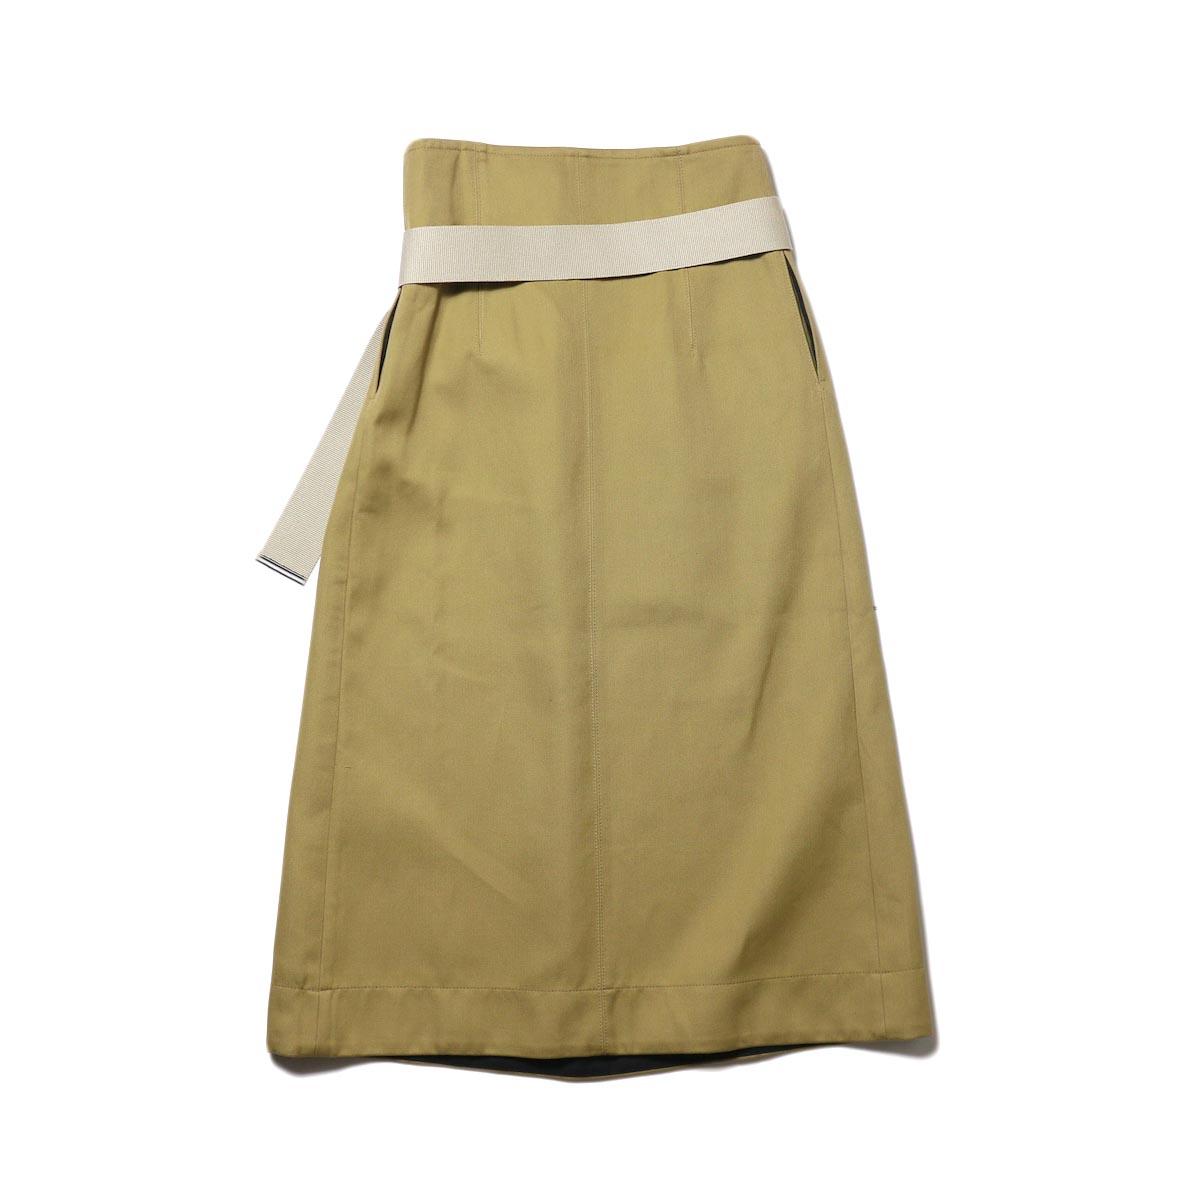 YLEVE / ELS COTTON DOUBLE CLOTH SKIRT (khaki) 背面